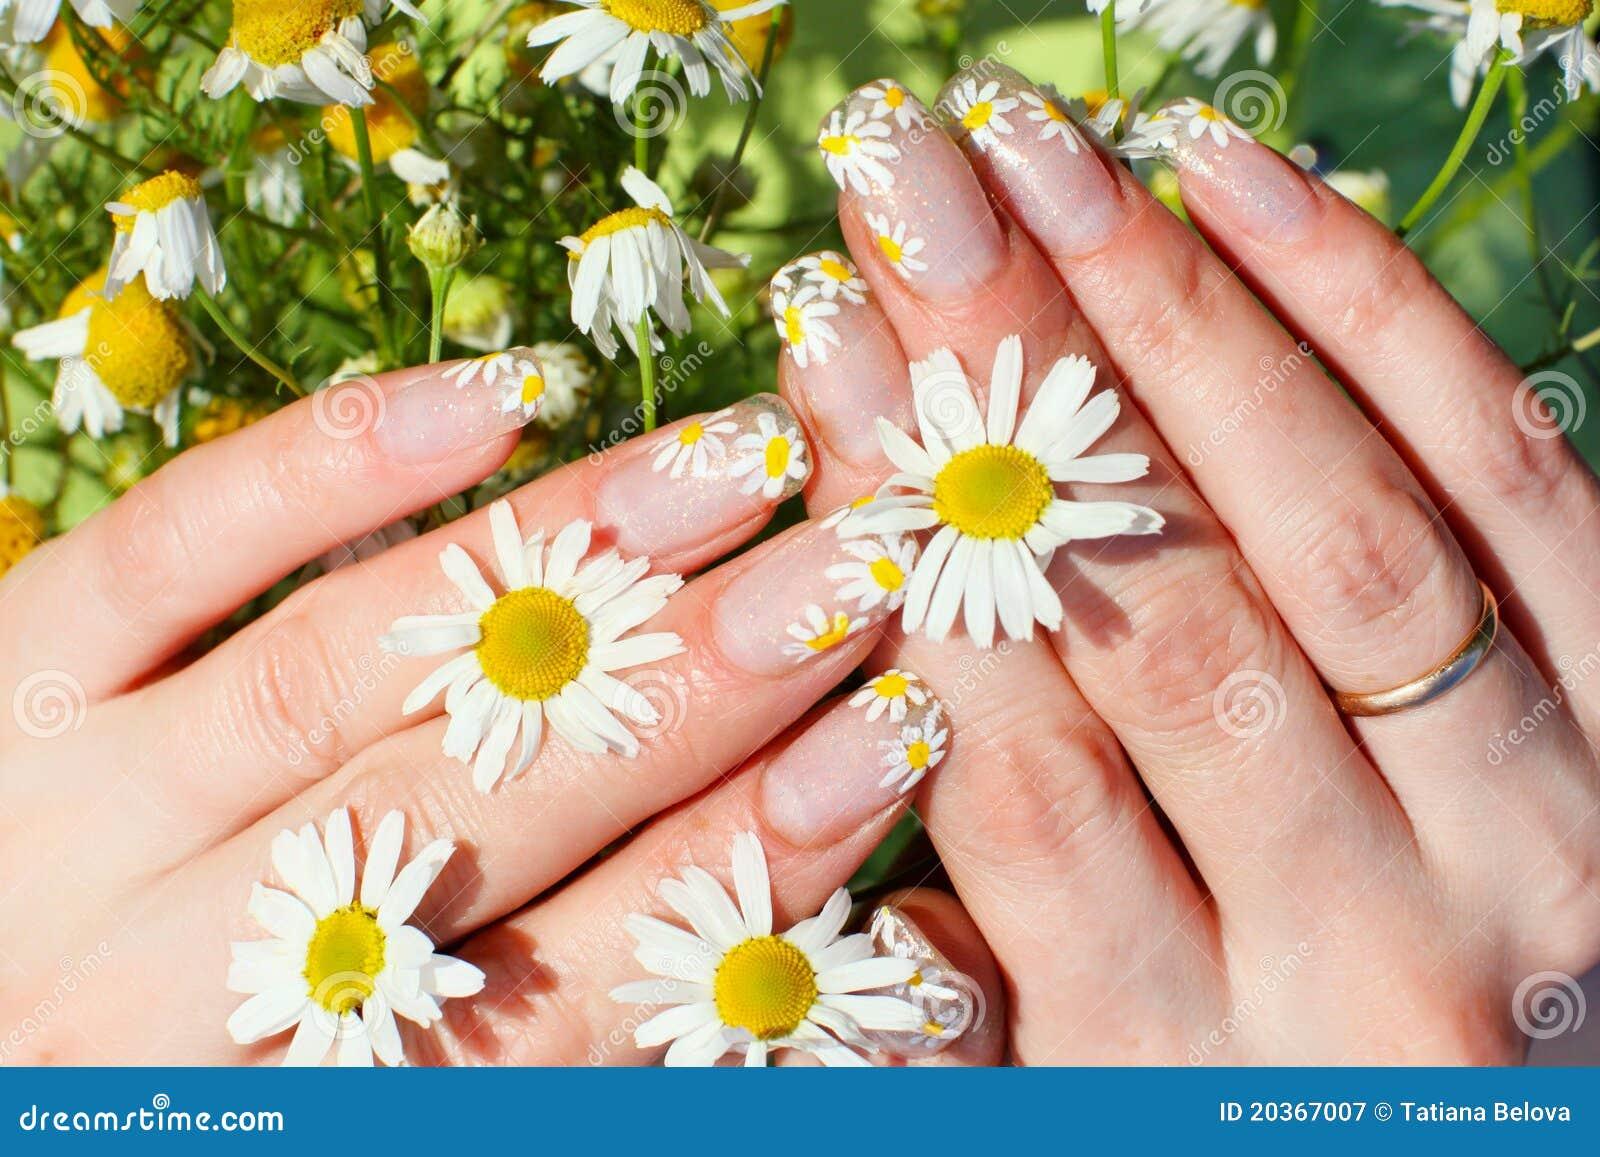 Nail art design stock image. Image of white, women, meadow - 20367007